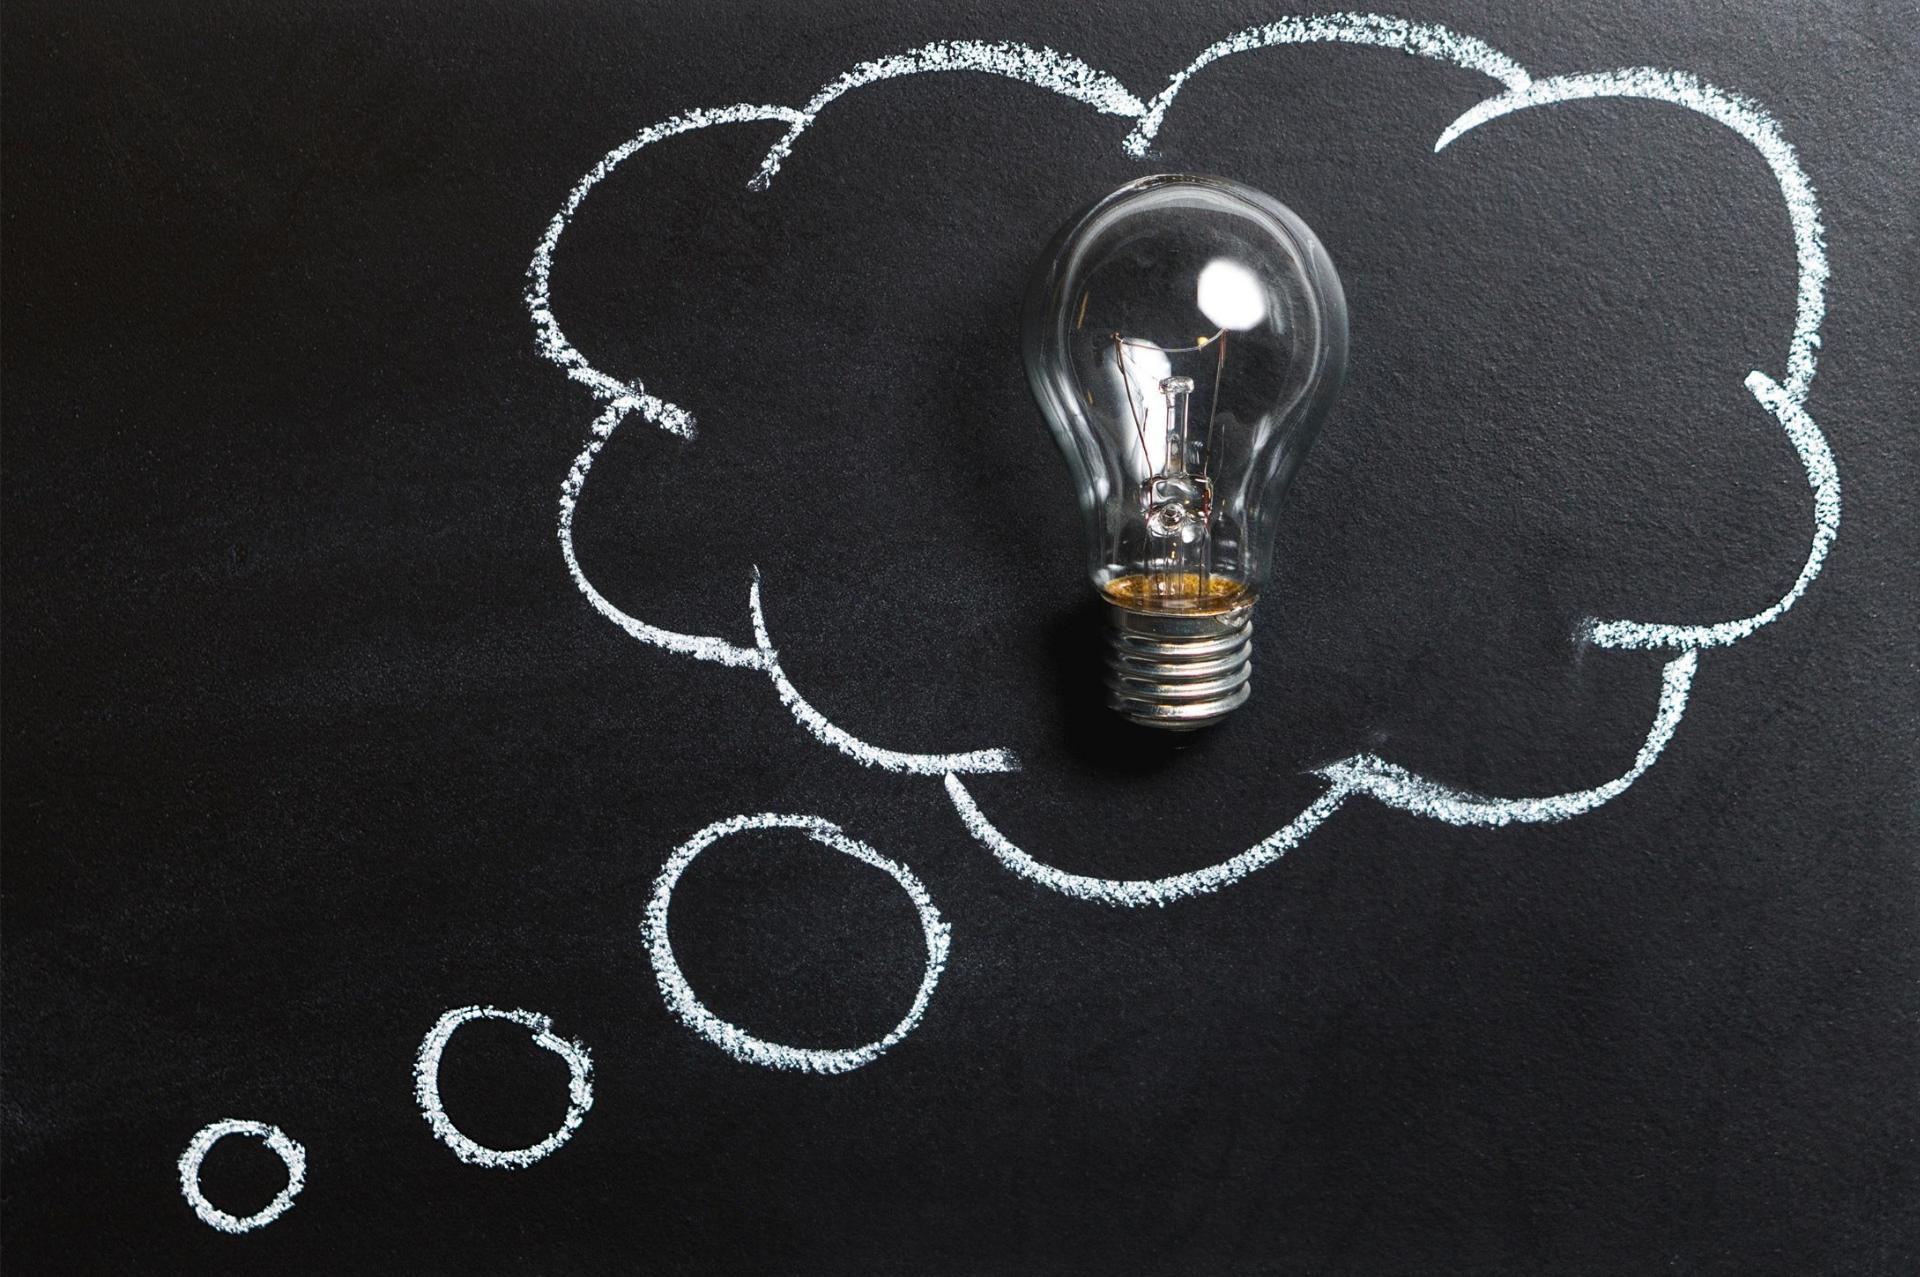 Light bulb on blackboard background surrounded by an idea bubble